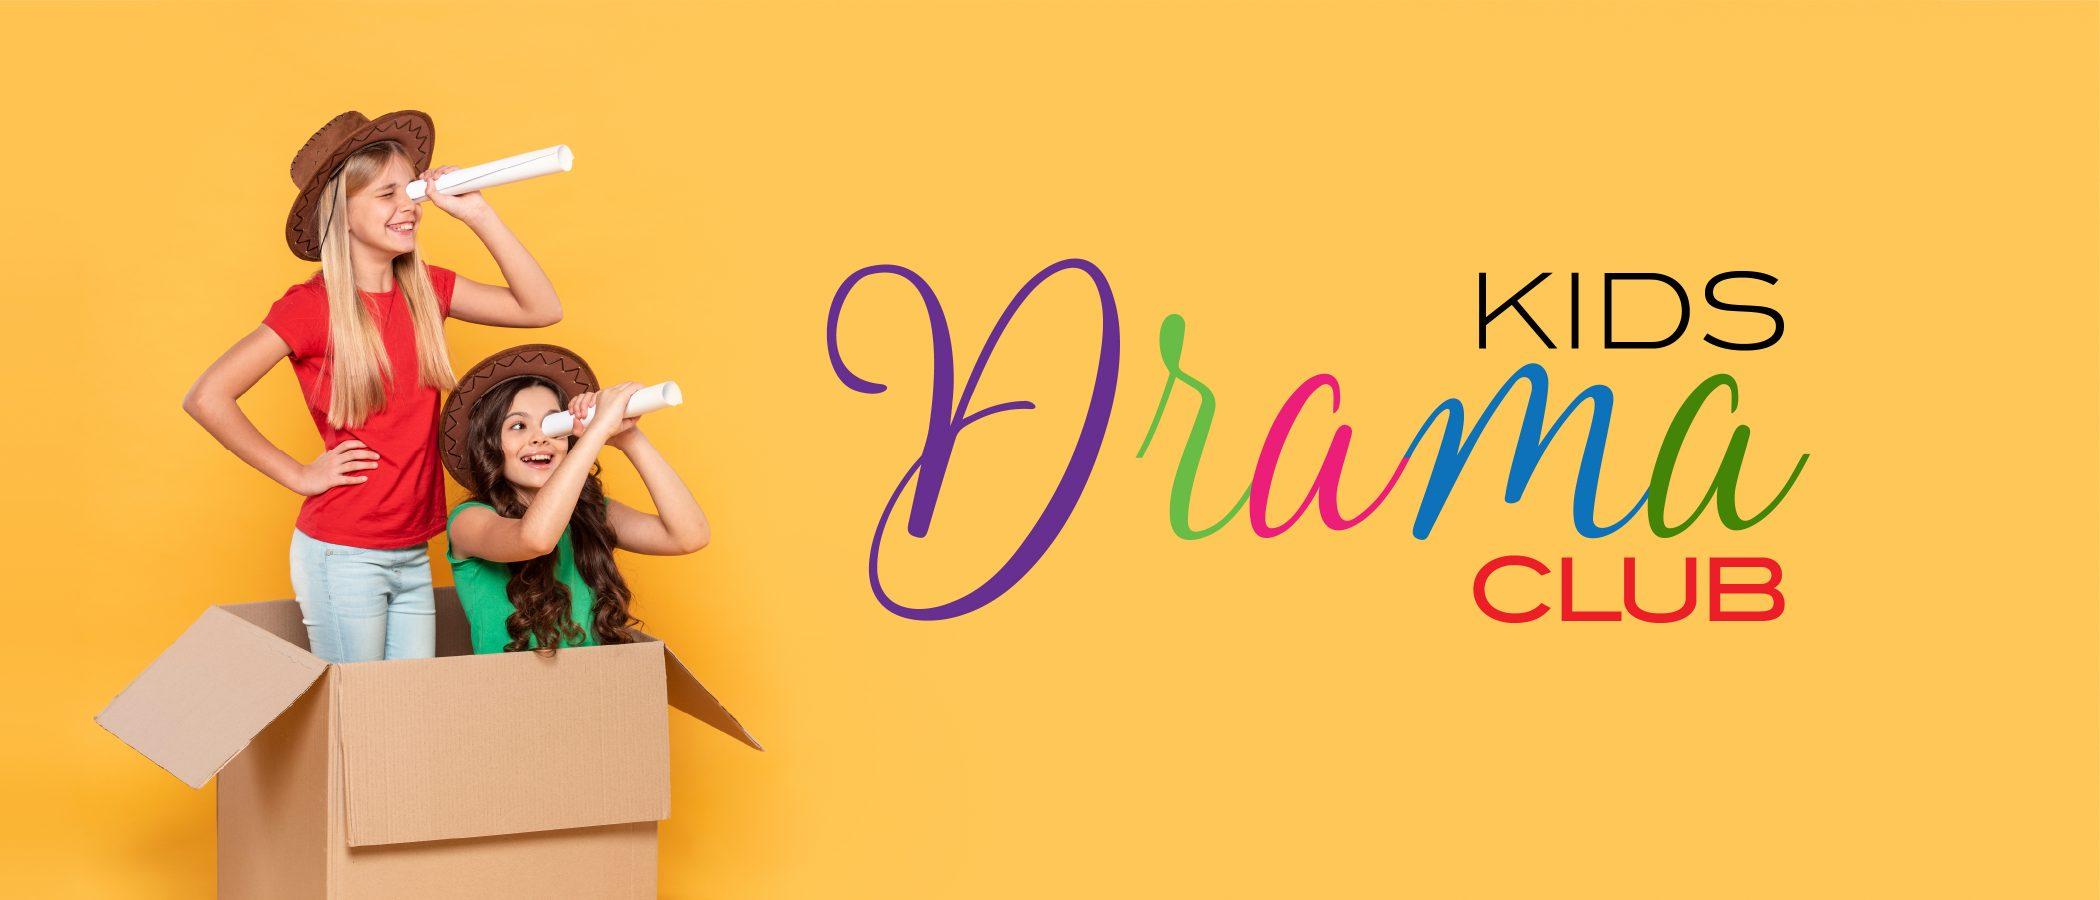 kids-drama-club-11brd-dq2021-web-banner2x-100